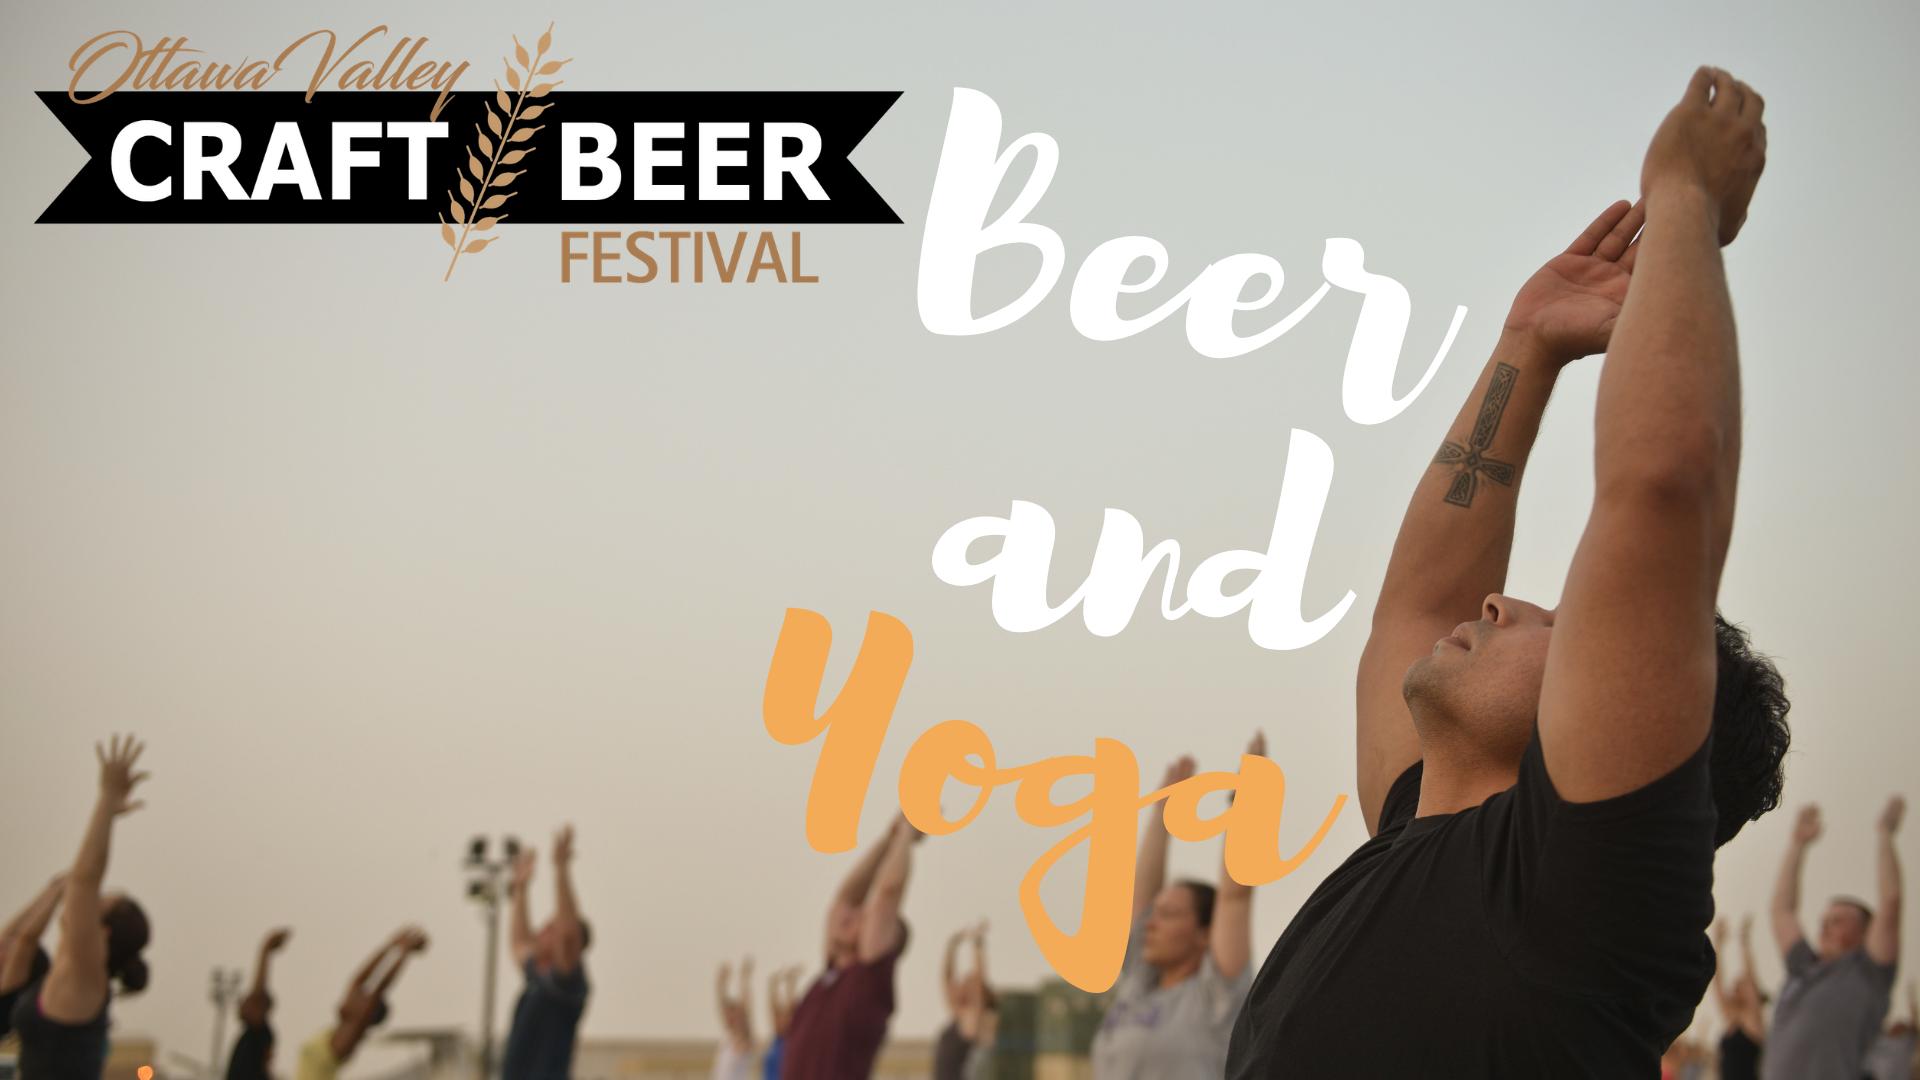 Ottawa Valley Craft Beer Festival - Beer + Yoga - White Pine Yoga